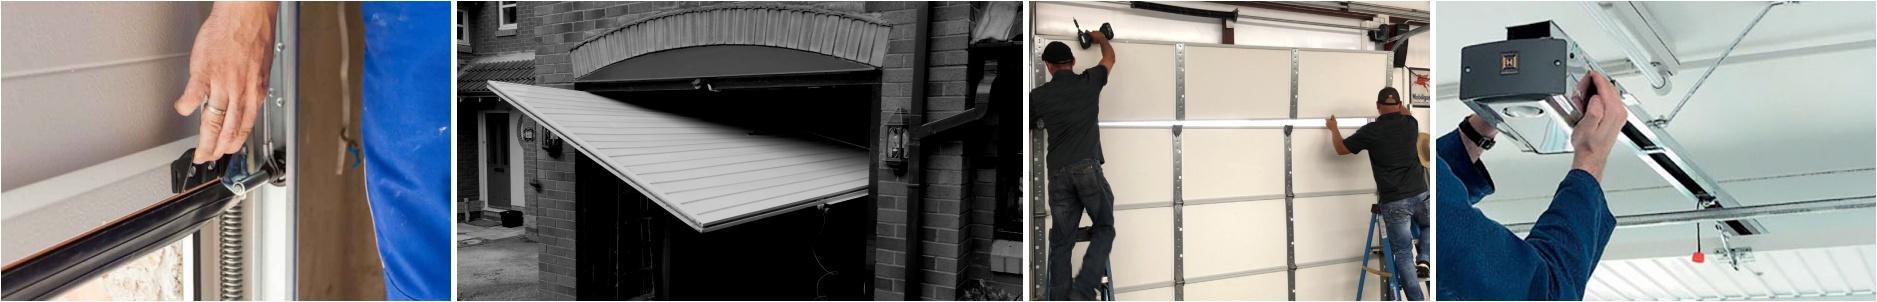 GARAGE DOOR REPAIRS - FAST SAME DAY SERVICE